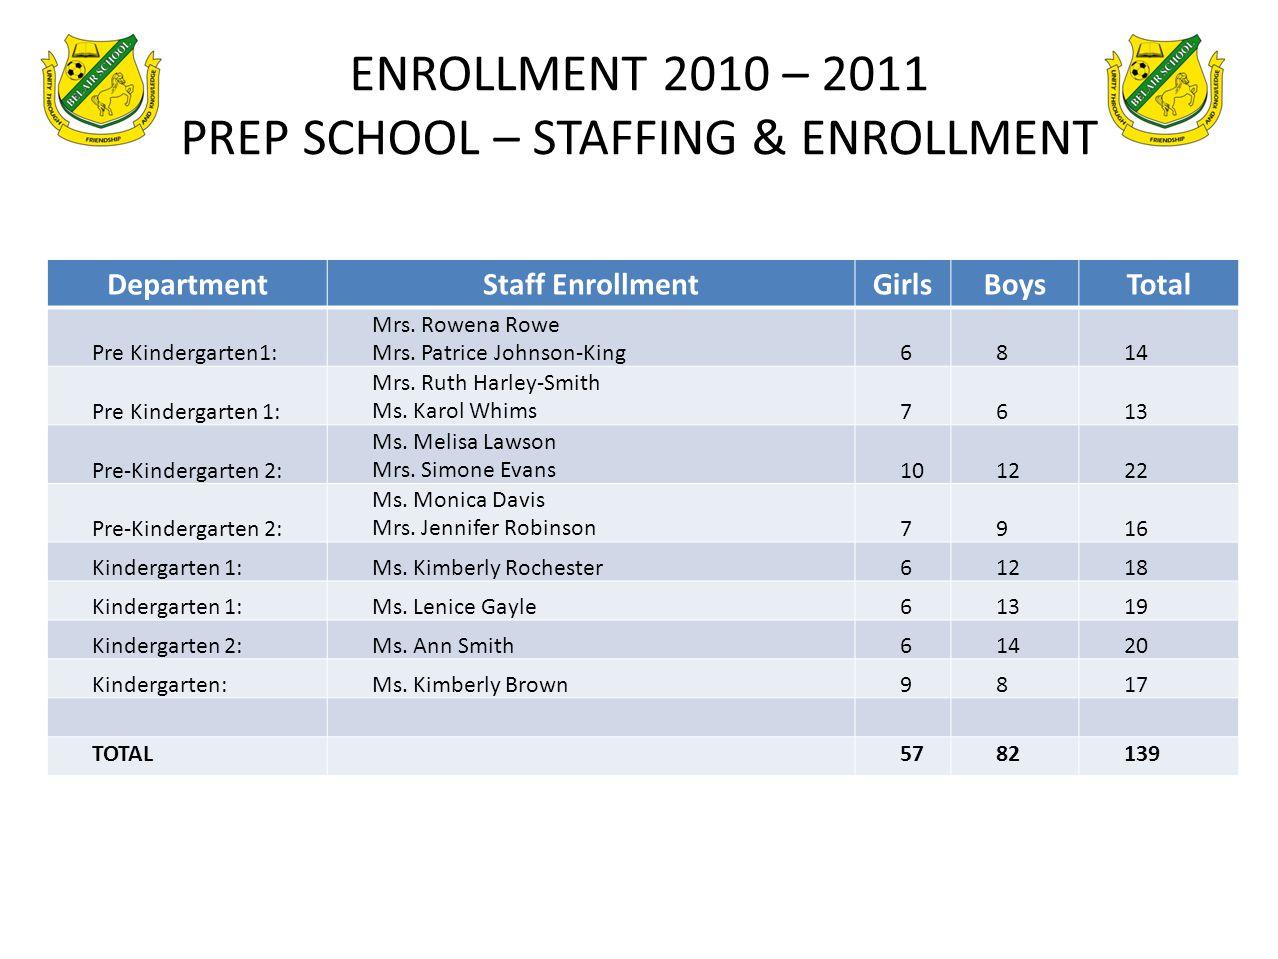 ENROLLMENT 2010 – 2011 PREP SCHOOL – STAFFING & ENROLLMENT